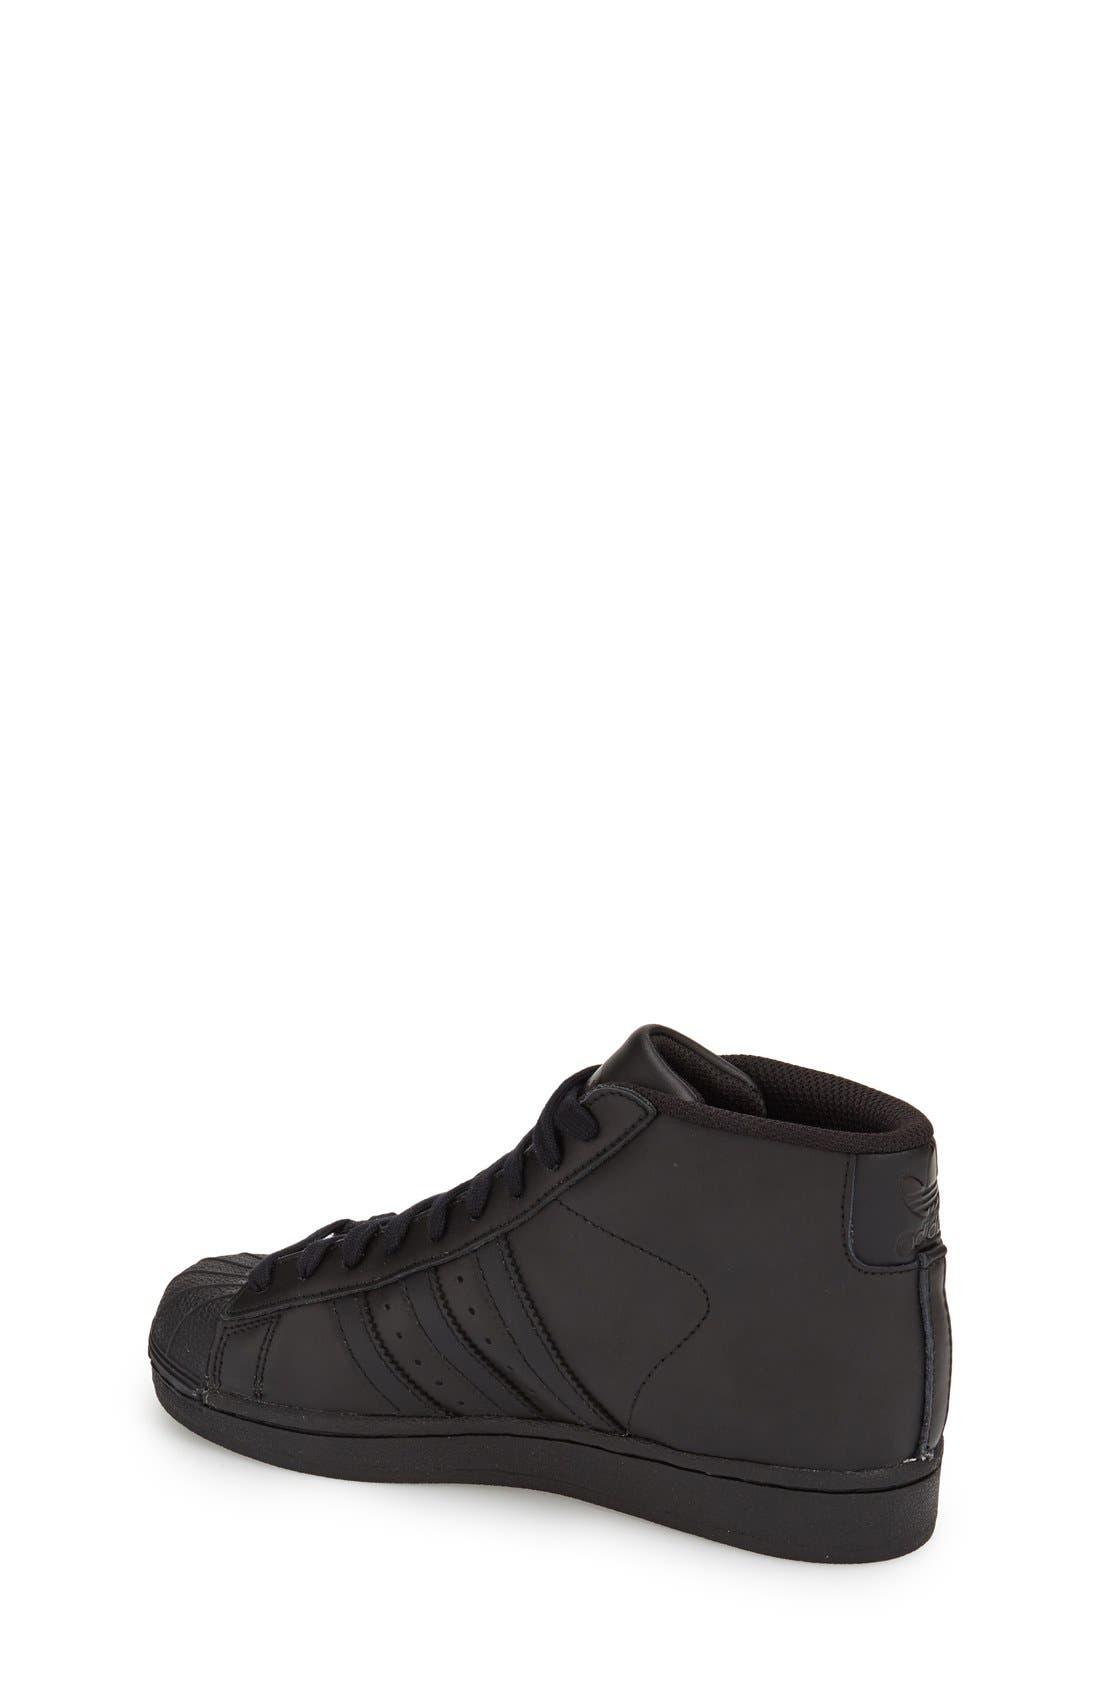 'Pro Model' High Top Sneaker,                             Alternate thumbnail 4, color,                             001